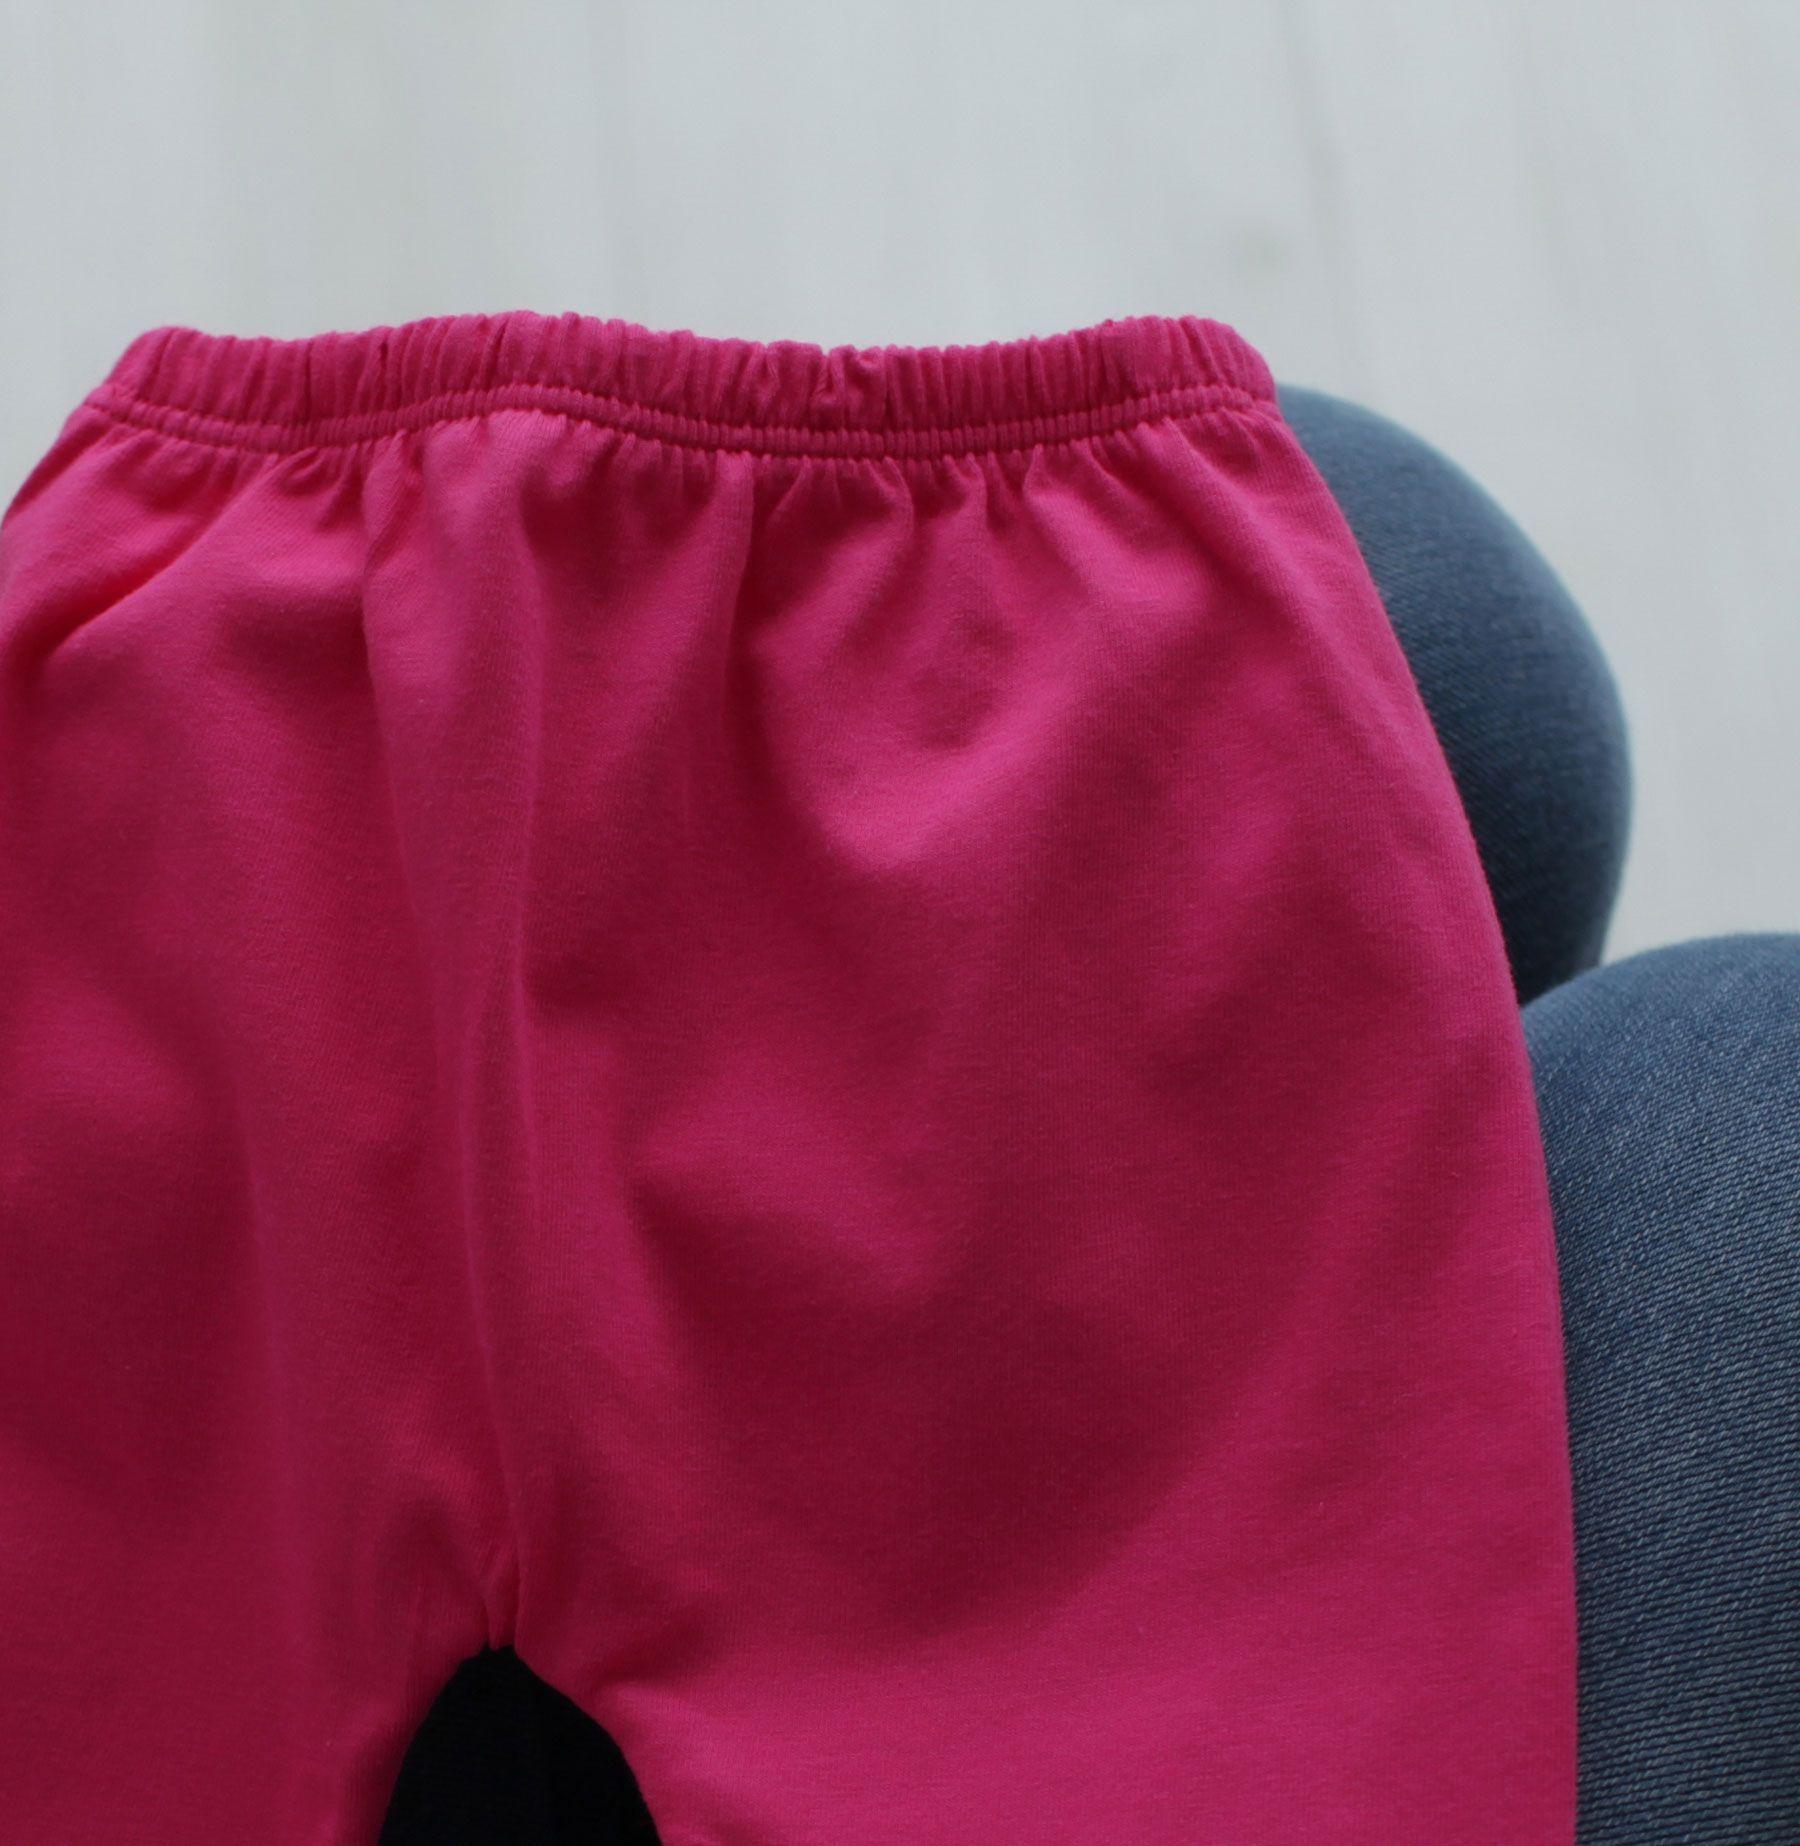 Calça Mijão (Culote) Bebê Malha Vira Pé Reversível Liso Pink